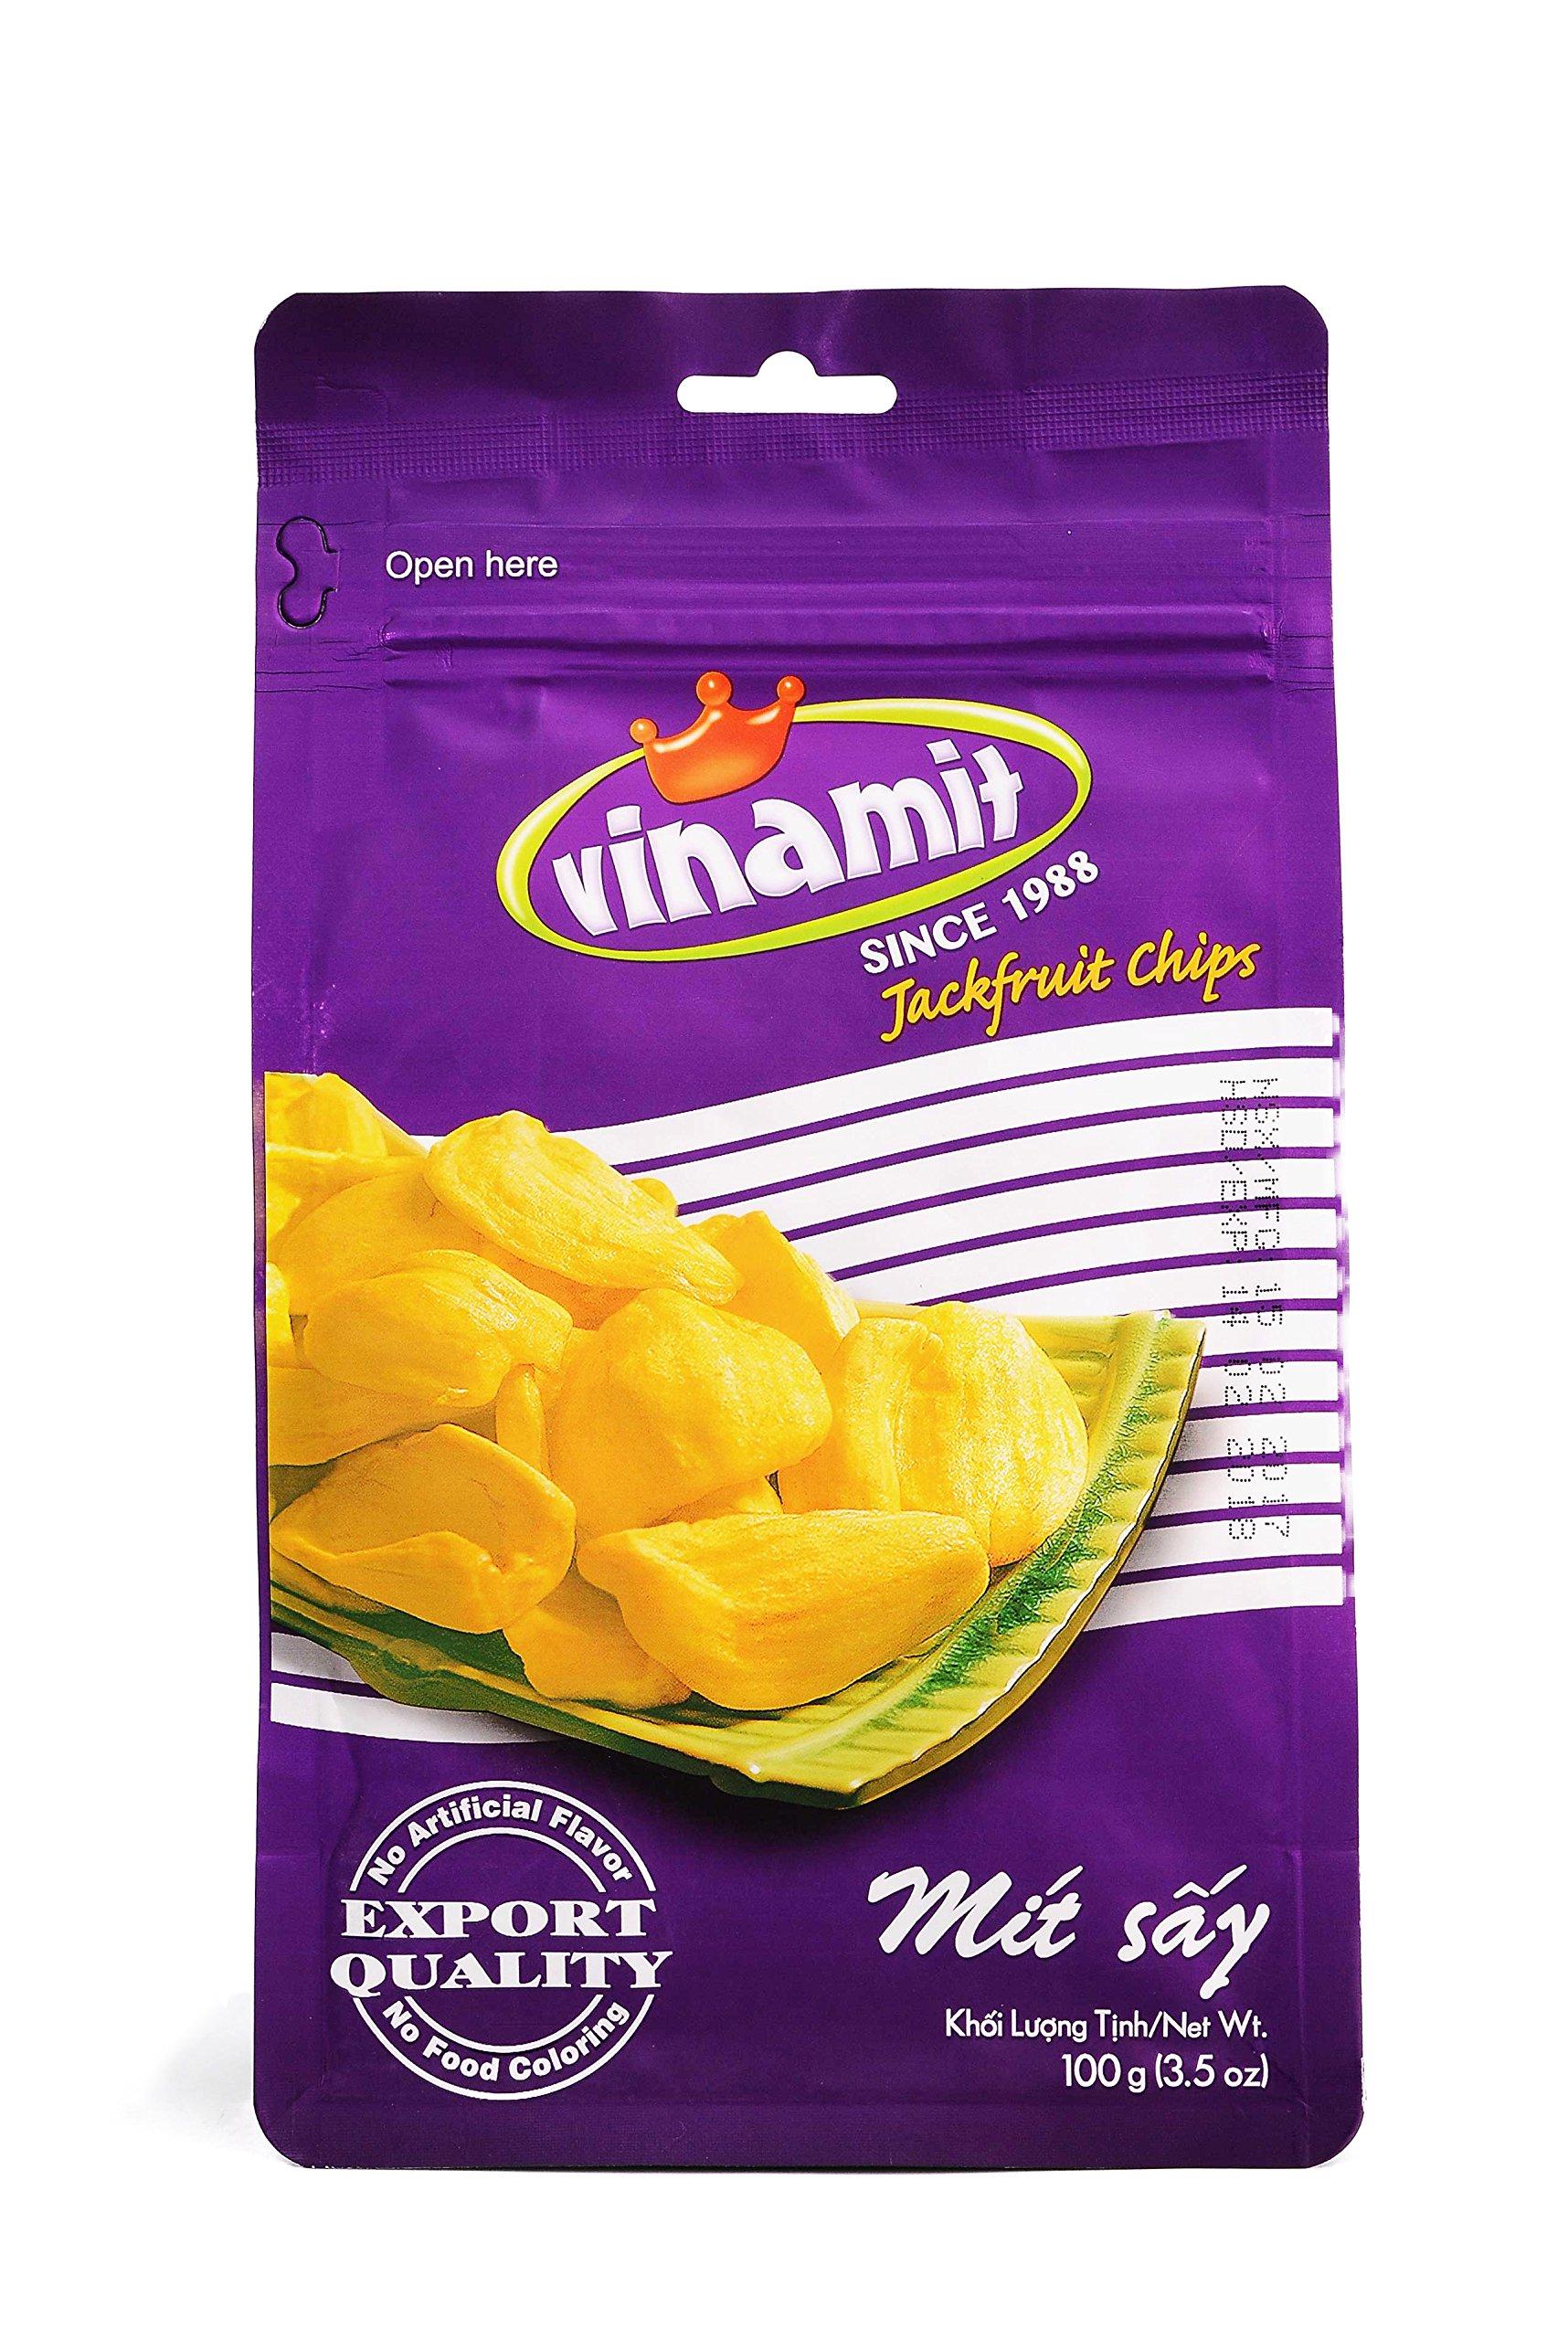 Vinamit Vietnam Jackfruit Chips - High Quality Food - 100 gram